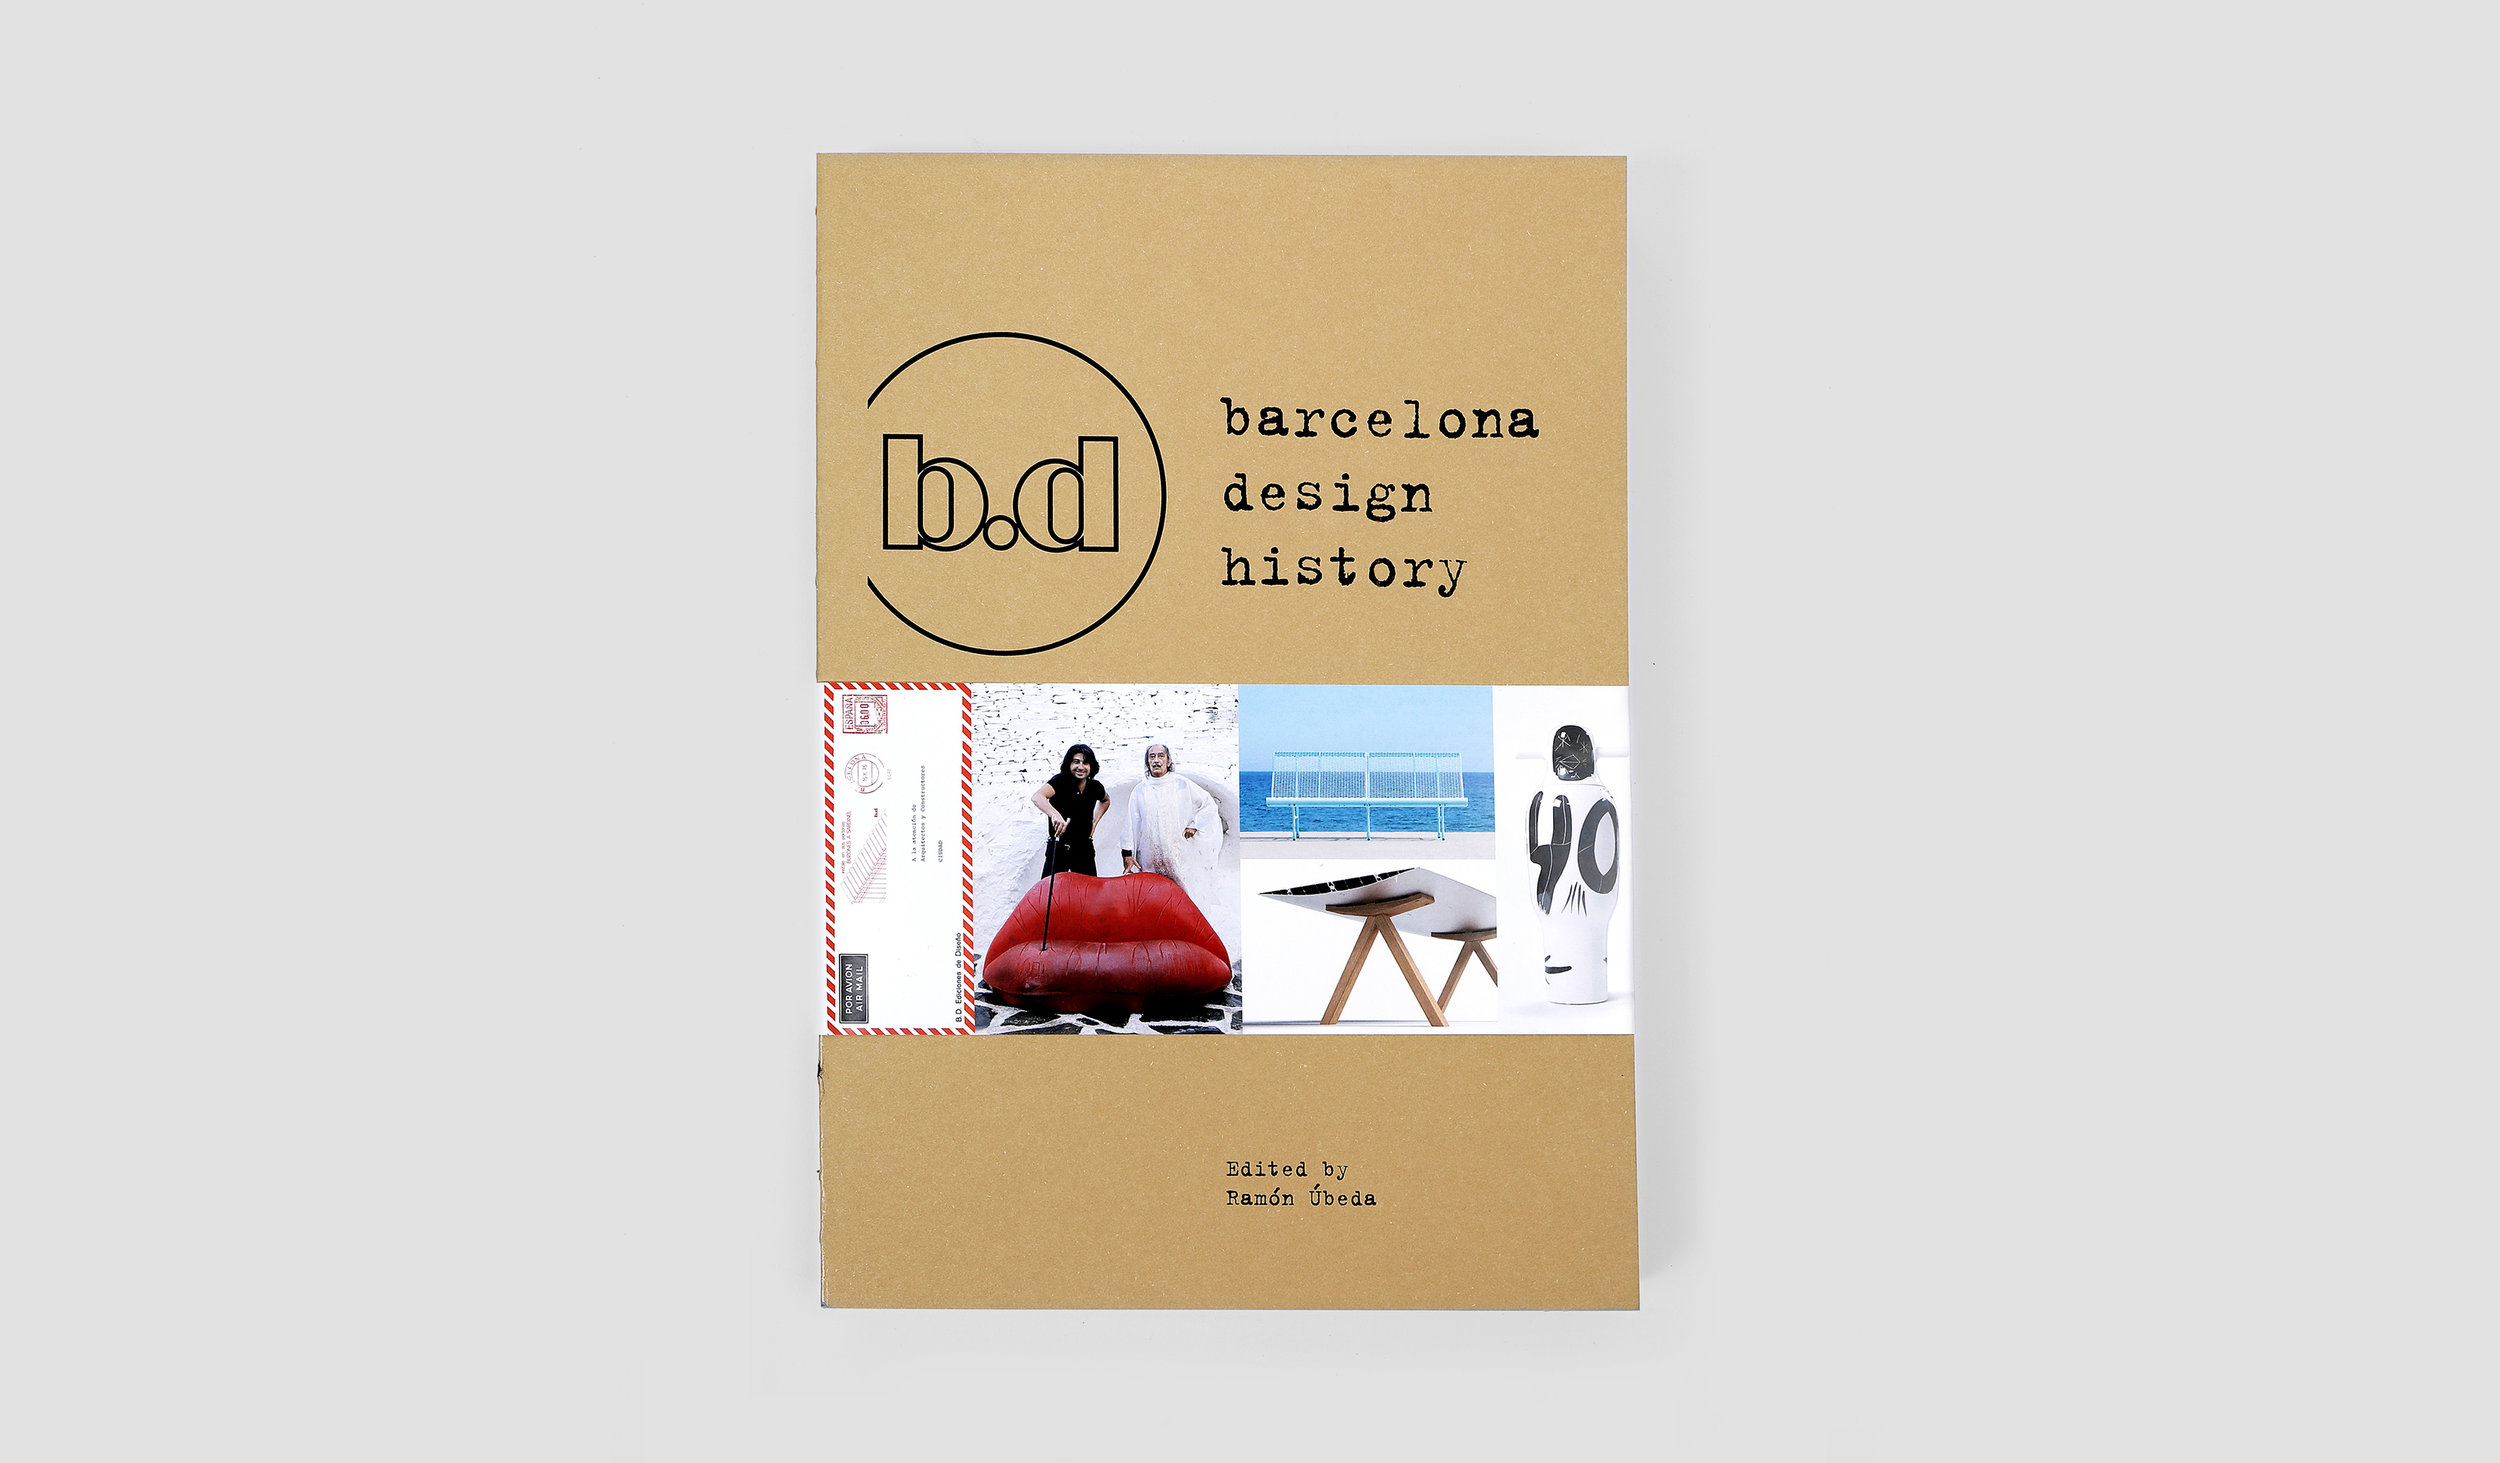 BD Barcelona Design History